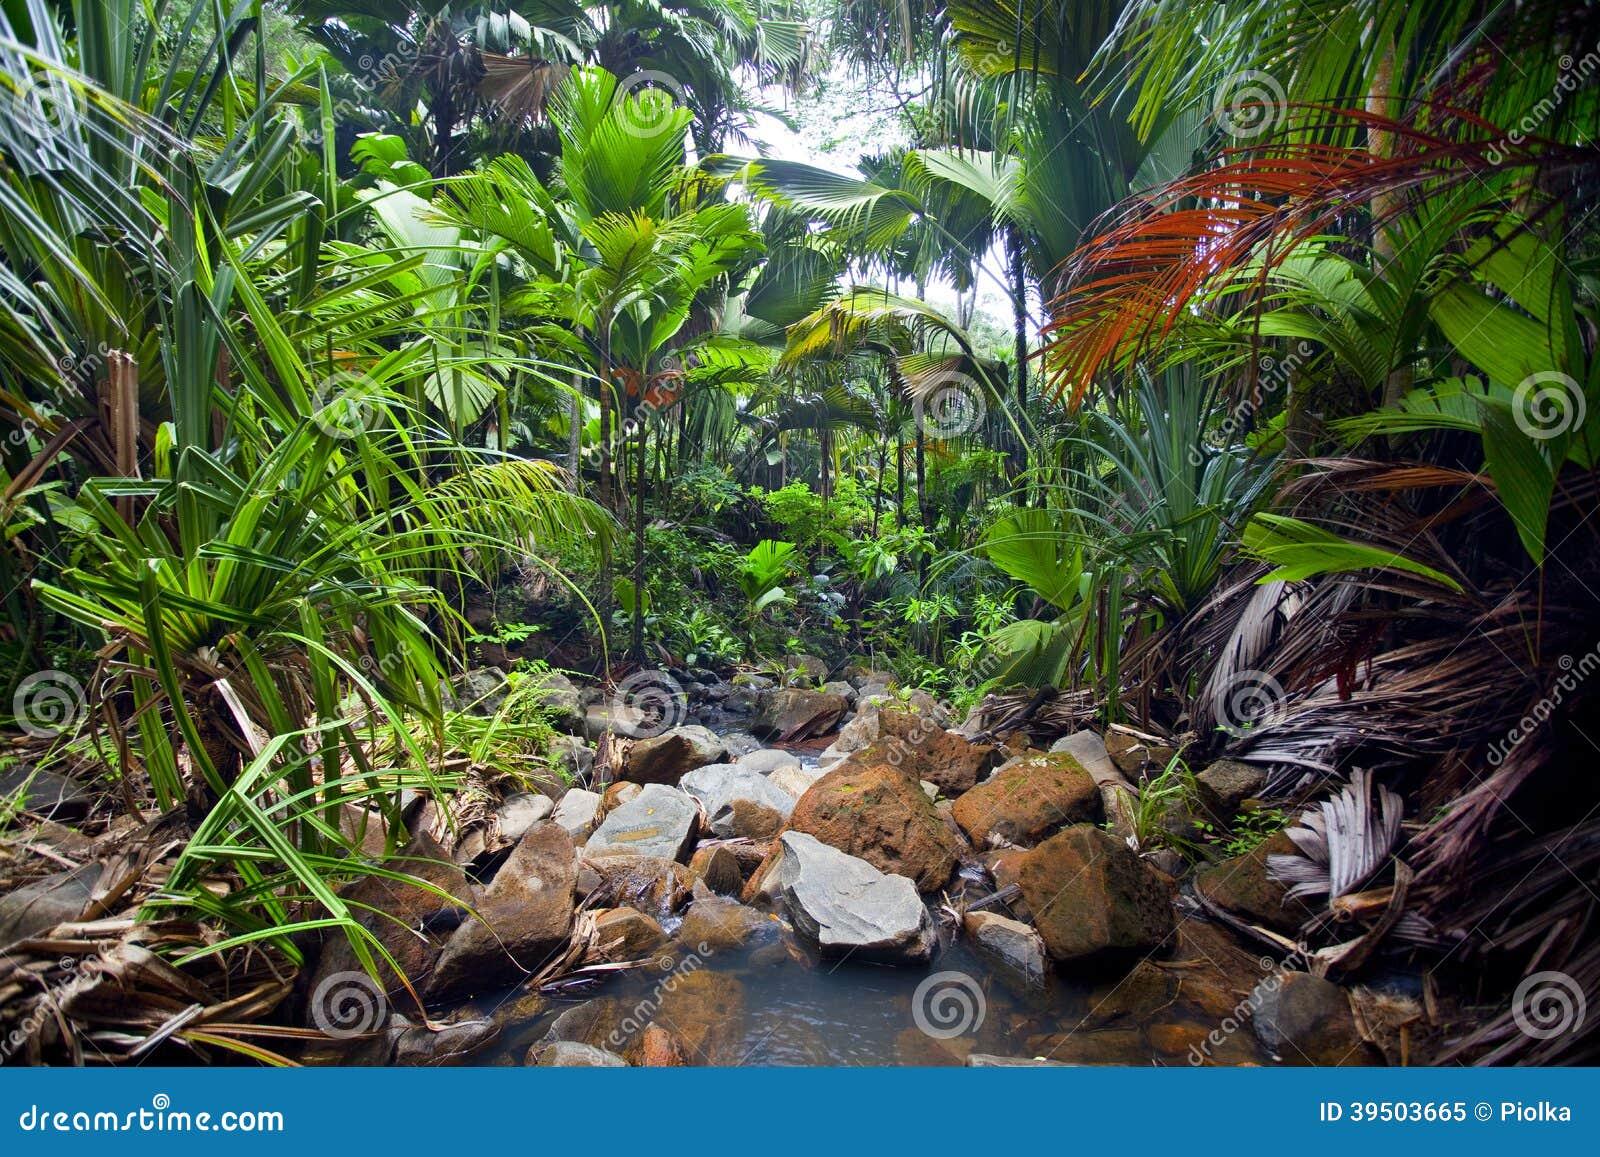 Jungle Landscape with creek